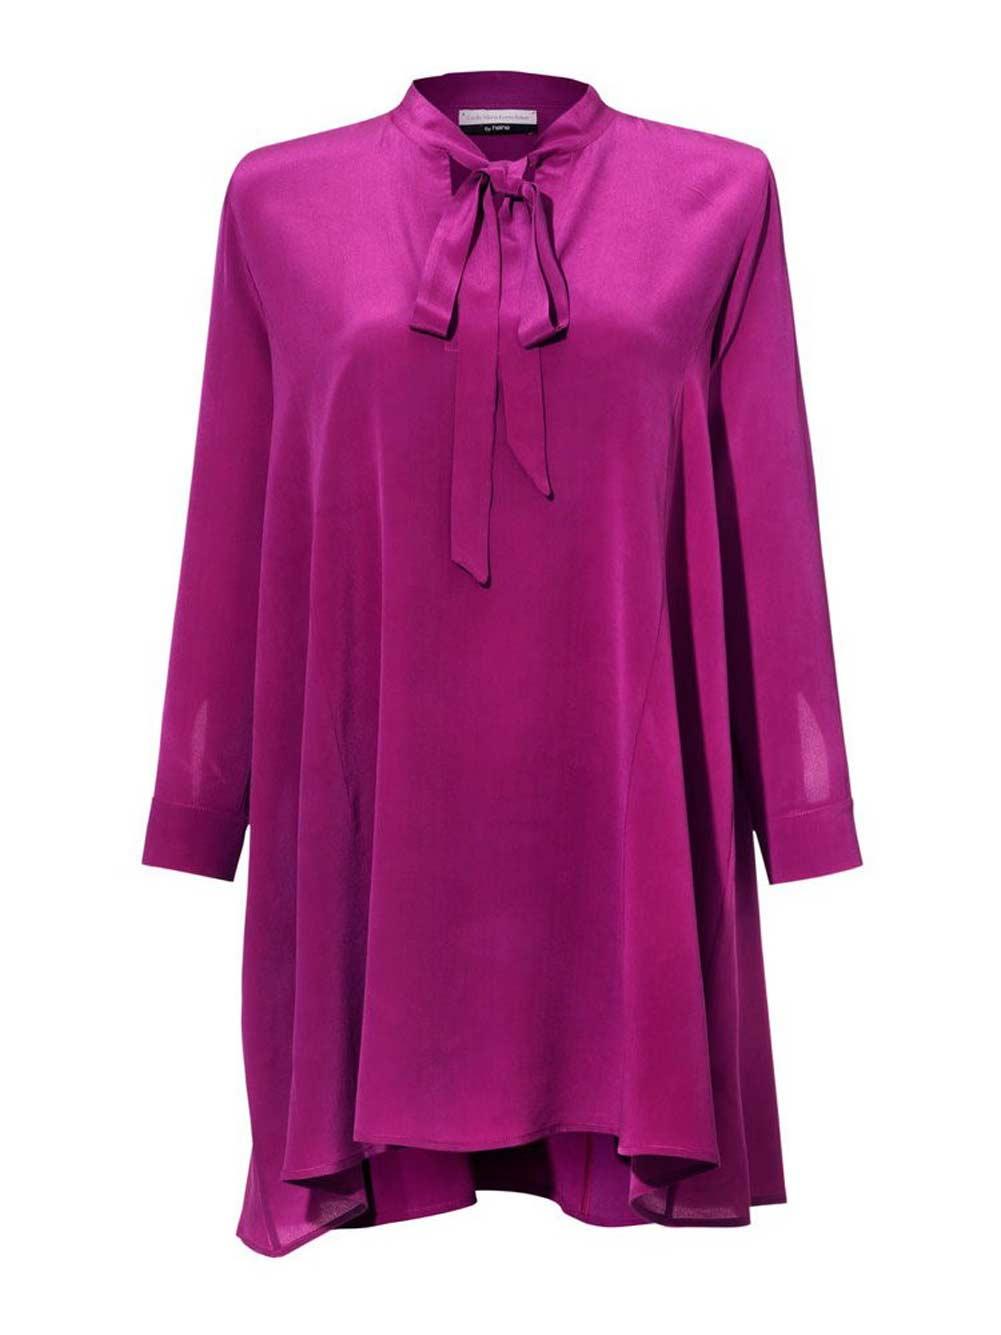 Langarmbluse Elegante Bluse Damen Lang Pink von Guido Maria Kretschmer Missforty